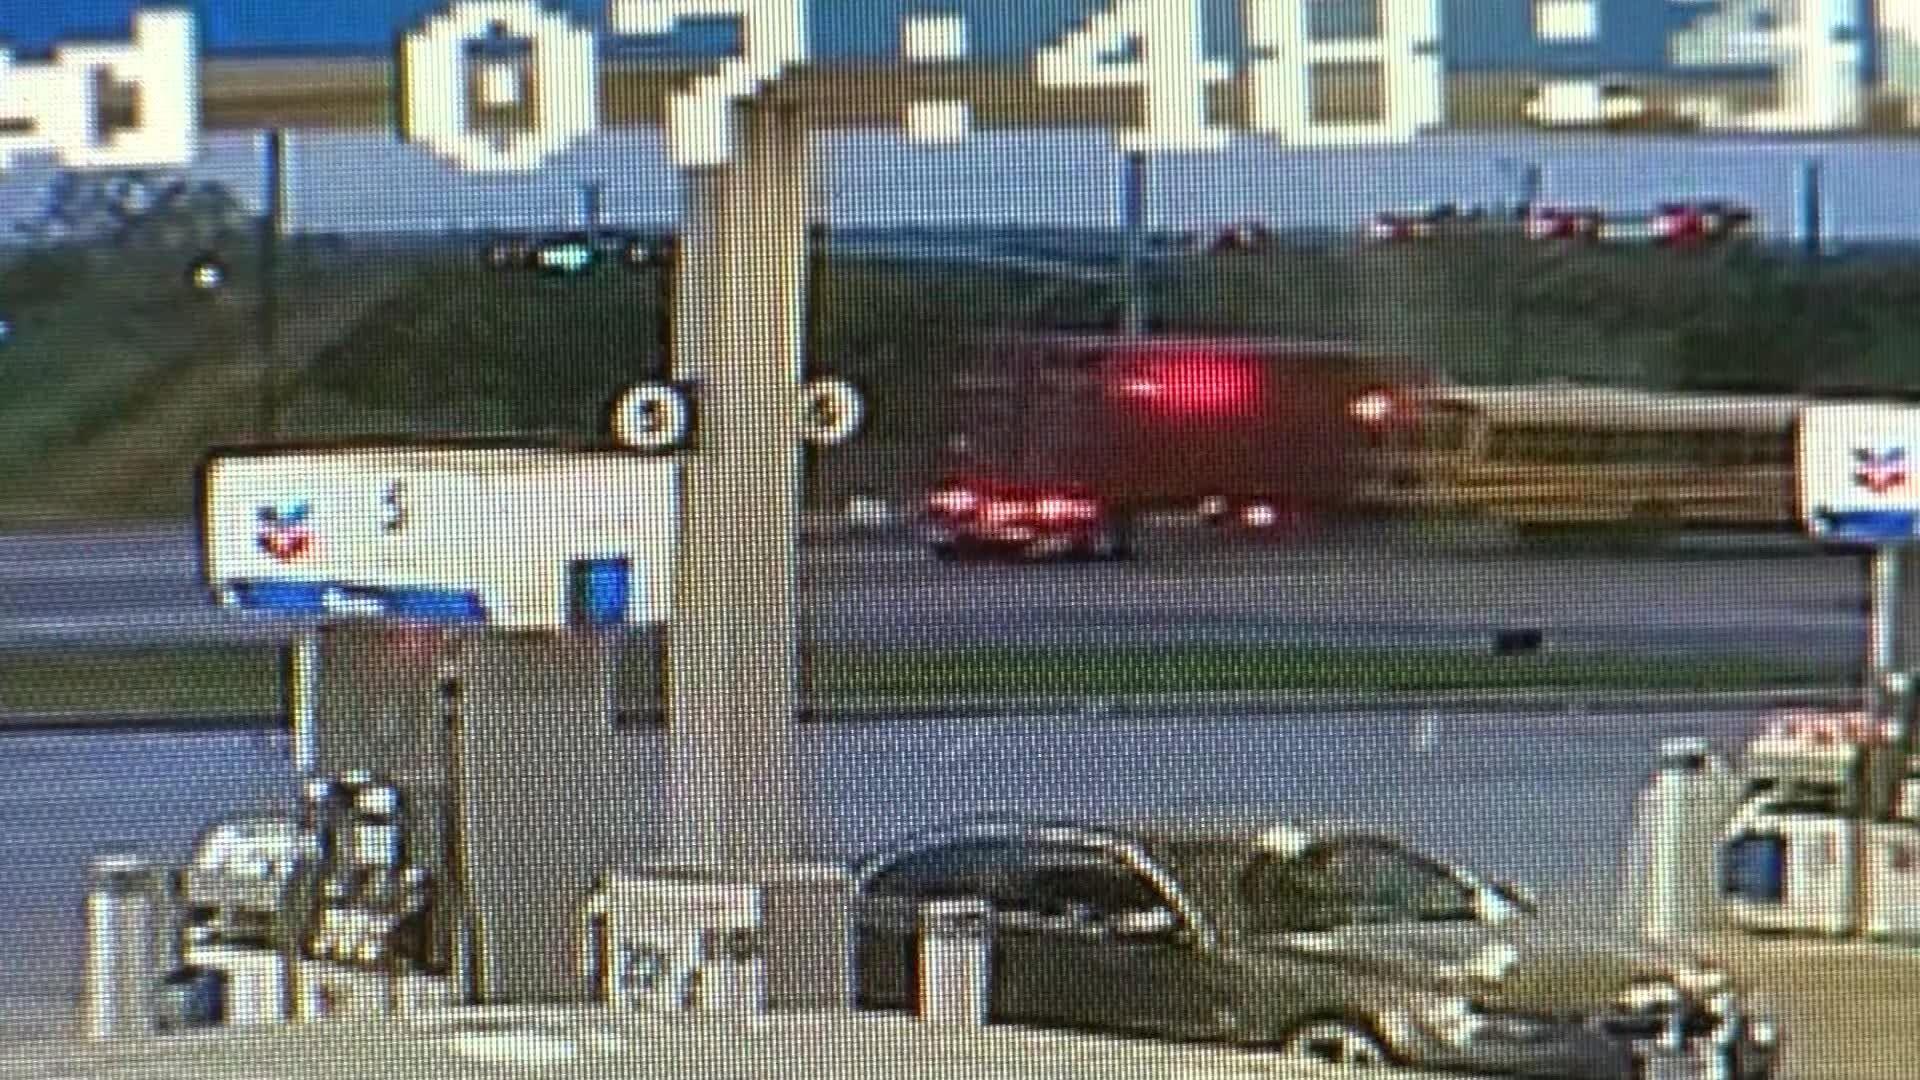 Terrifying video: Semi truck slams into school bus in Texas